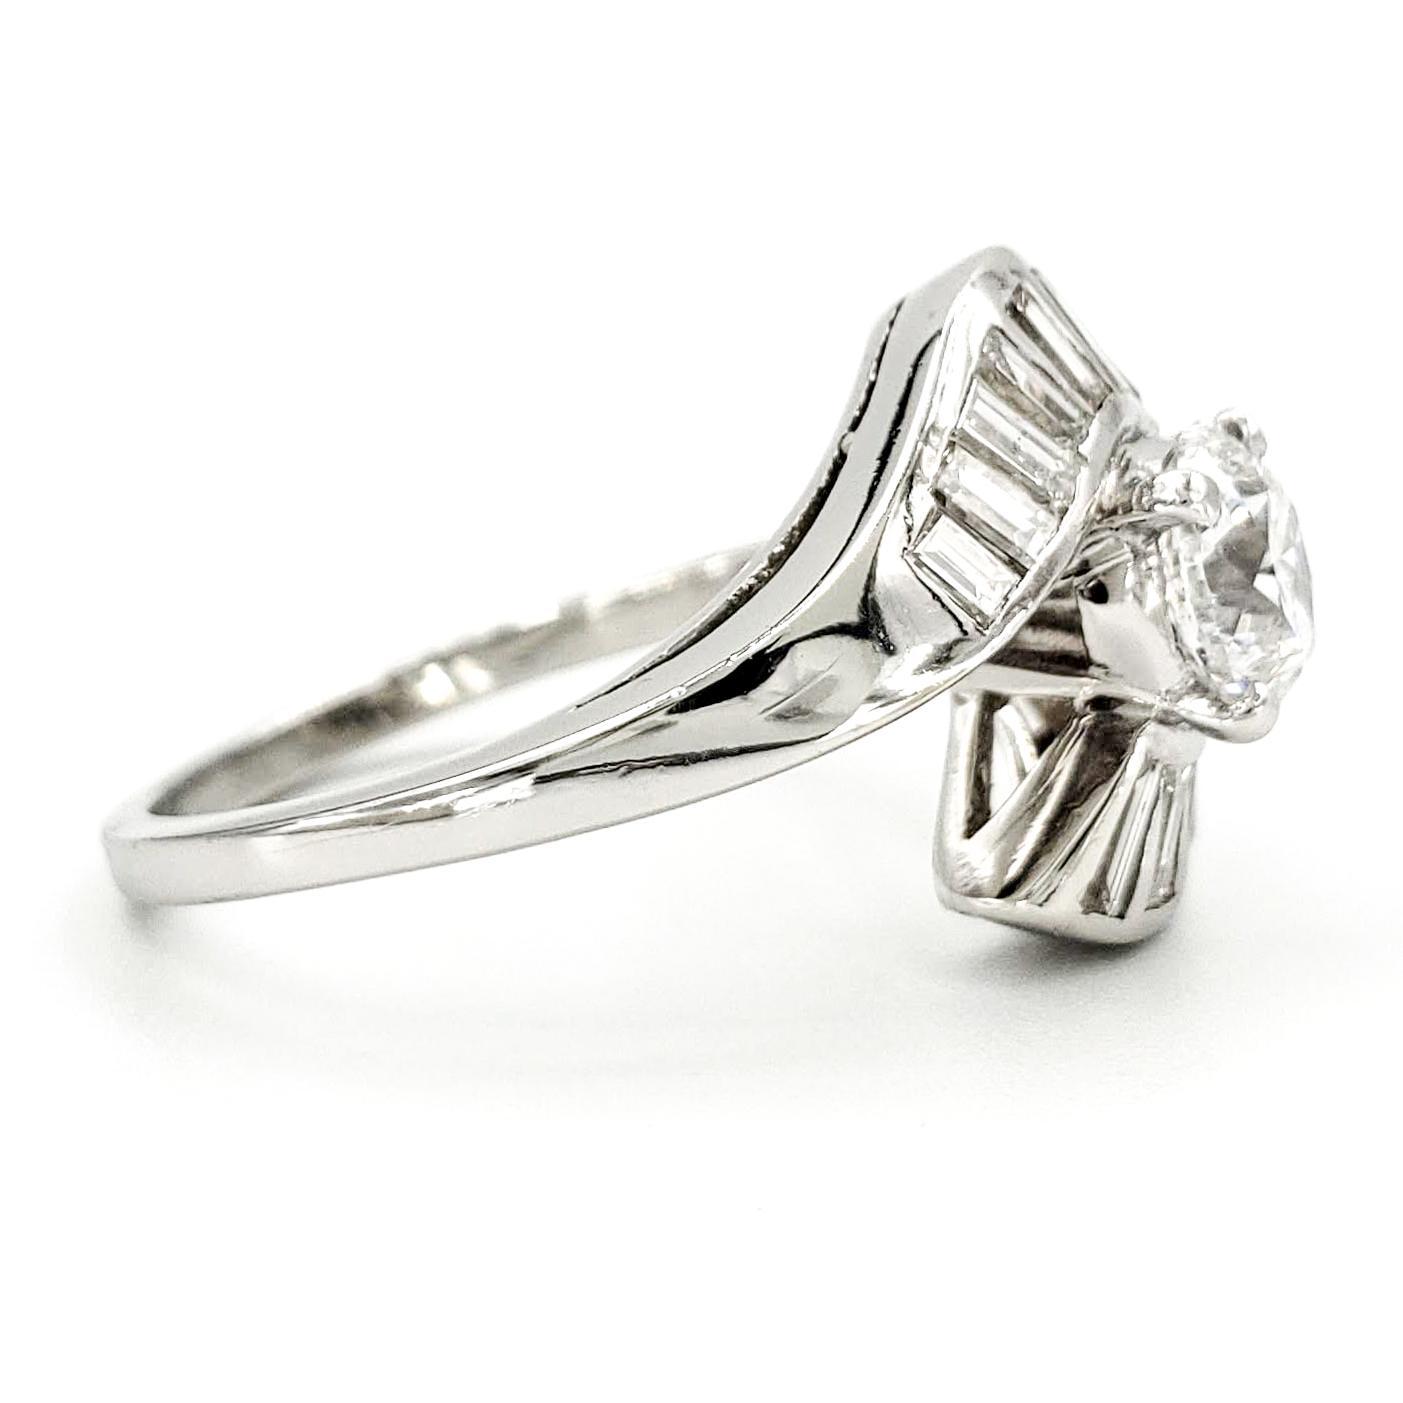 vintage-platinum-engagement-ring-with-0-90-carat-transitional-cut-diamond-egl-e-si1